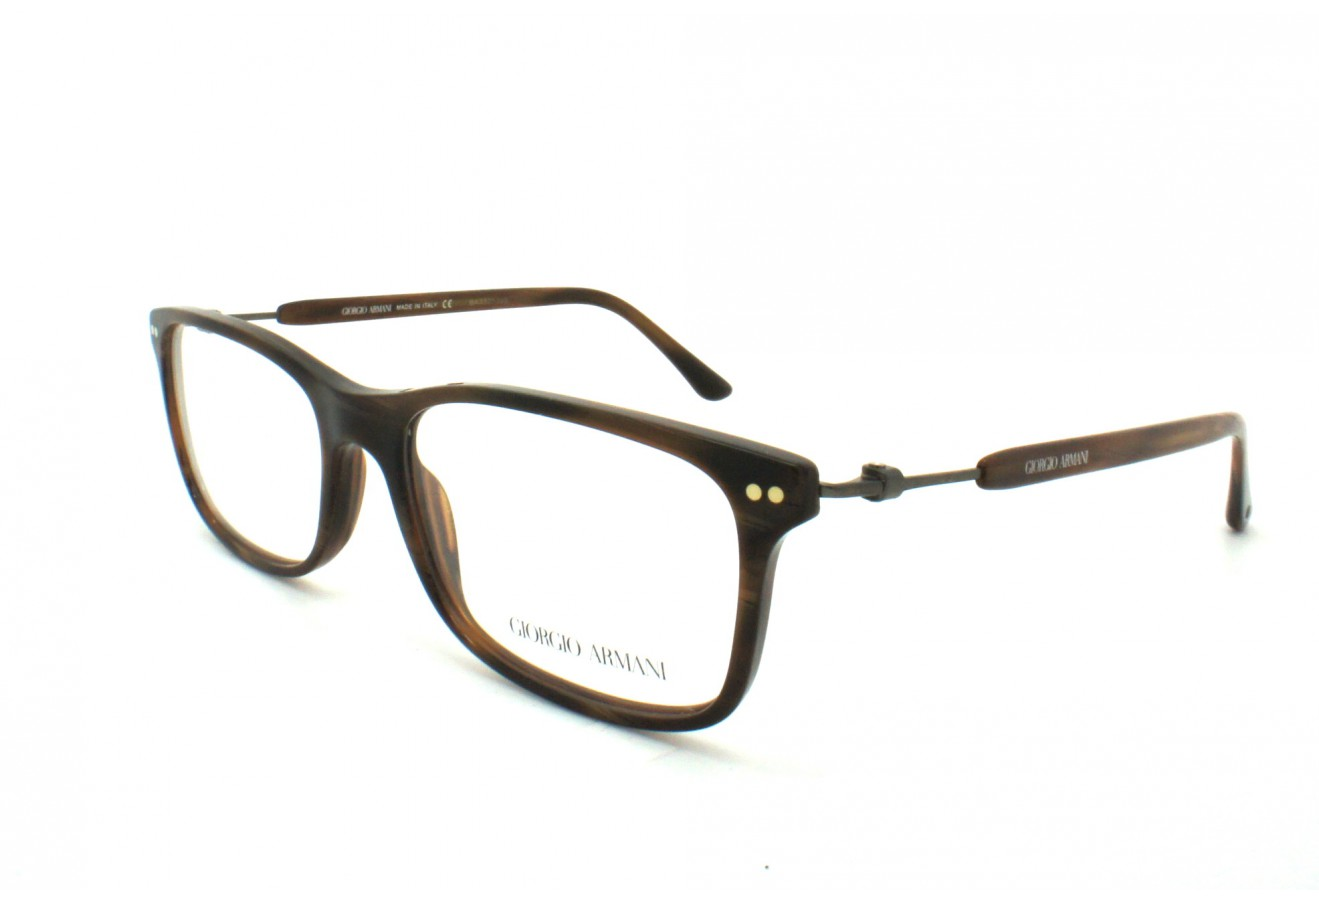 lunettes de vue giorgio armani homme. Black Bedroom Furniture Sets. Home Design Ideas